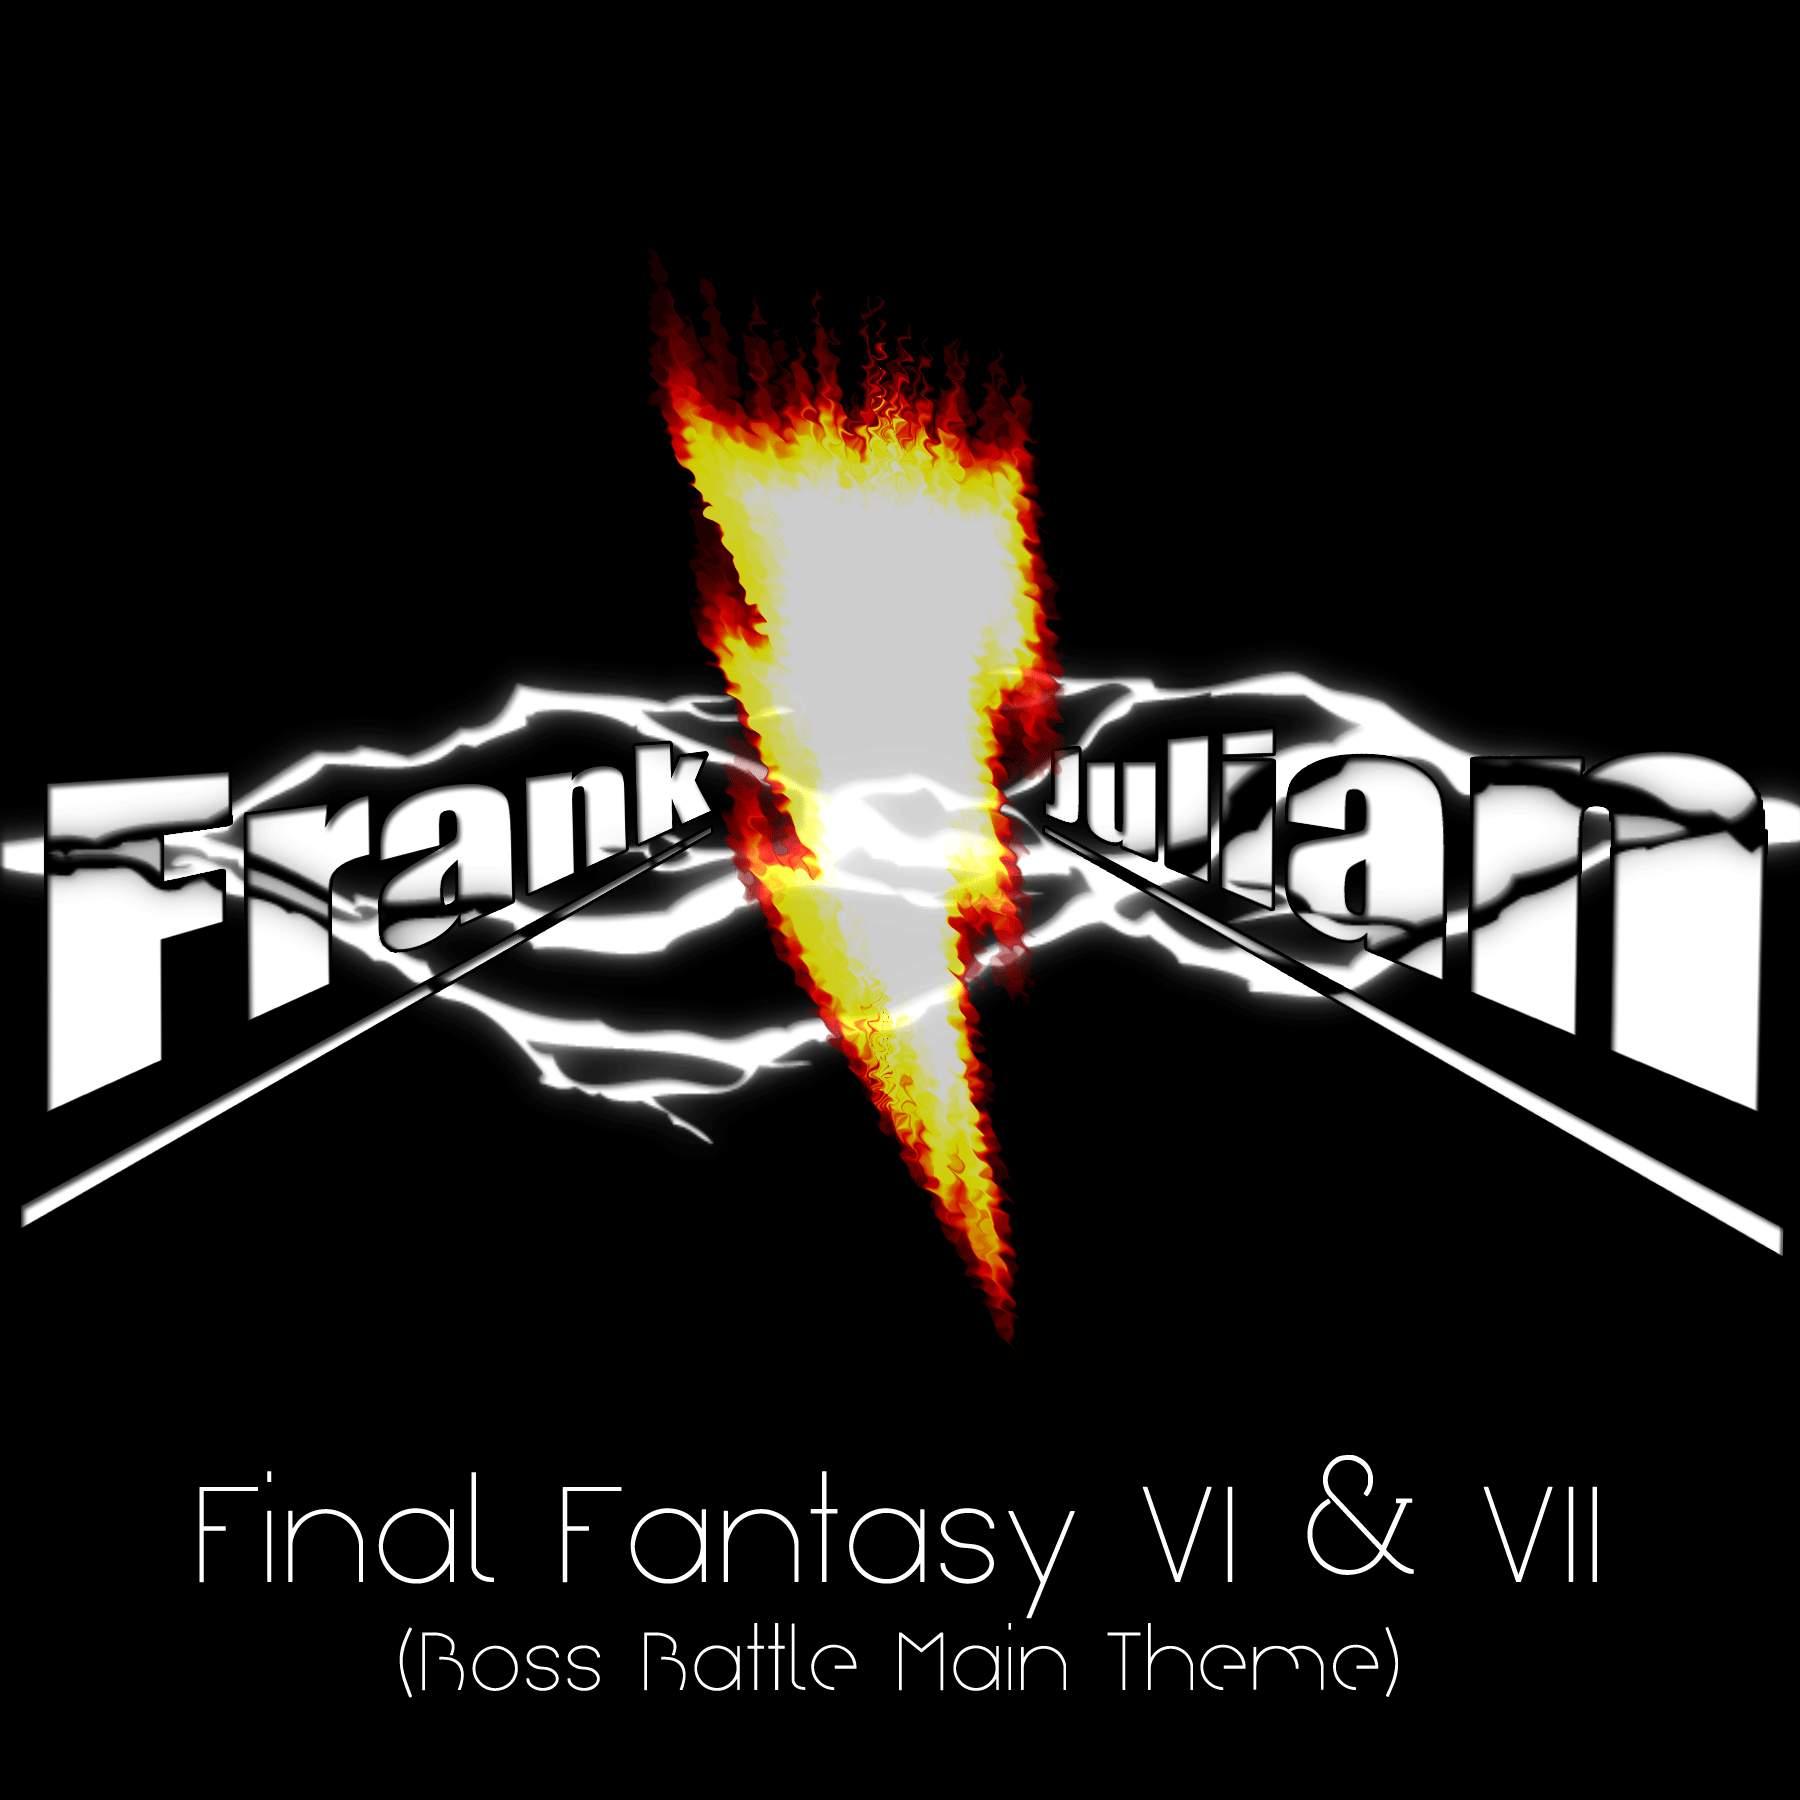 Uematsu, Nobuo: Final Fantasy VI & VII: The Decisive Battle /Those Who Fight Further (Medley   Metal Cover)